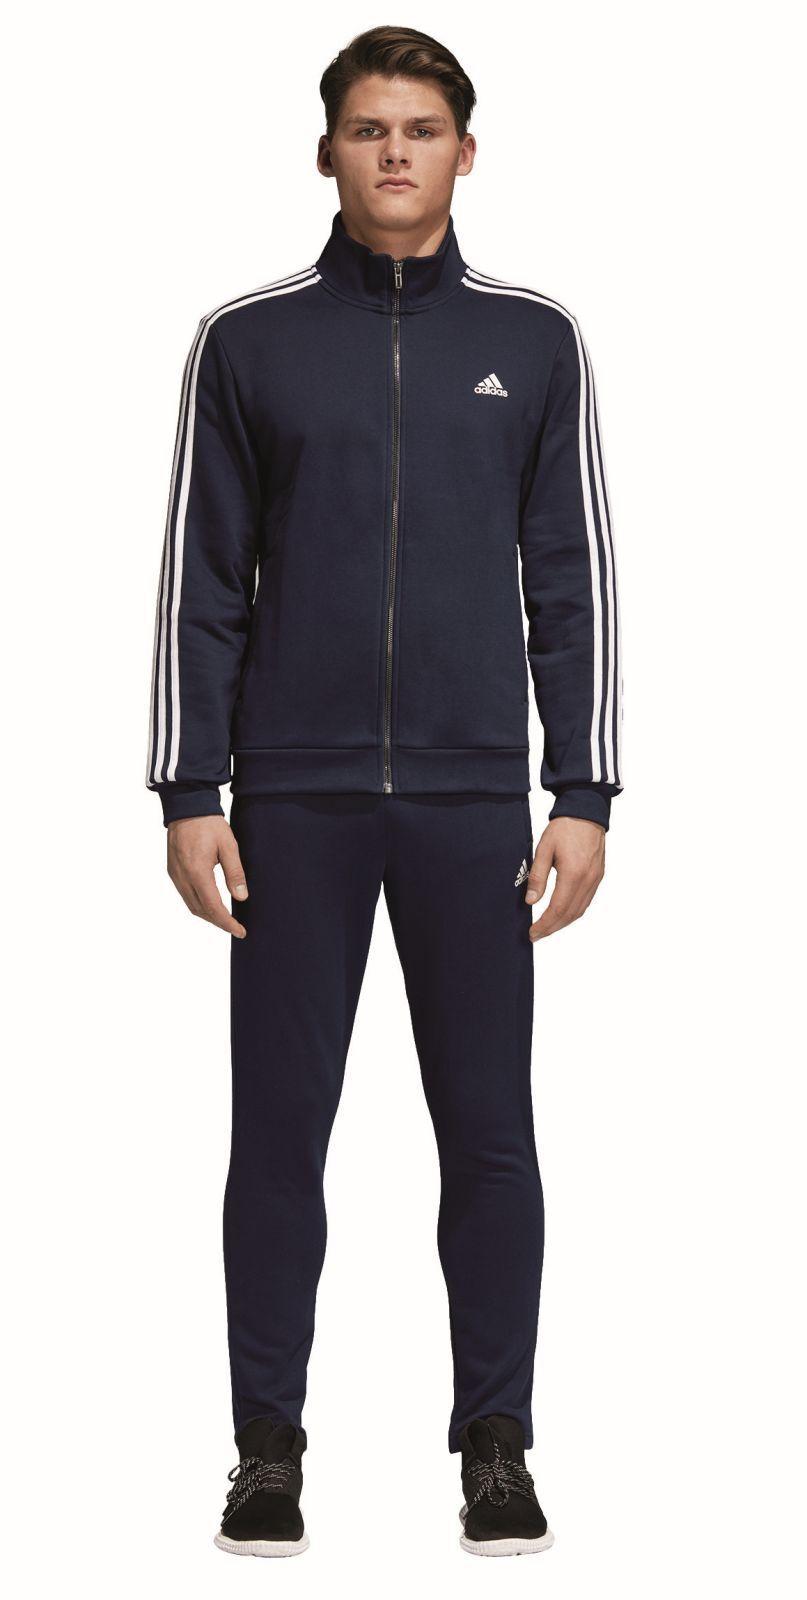 adidas Performance Herren Trainingsanzug Cotton Relax Tracksuit 3S navy blau